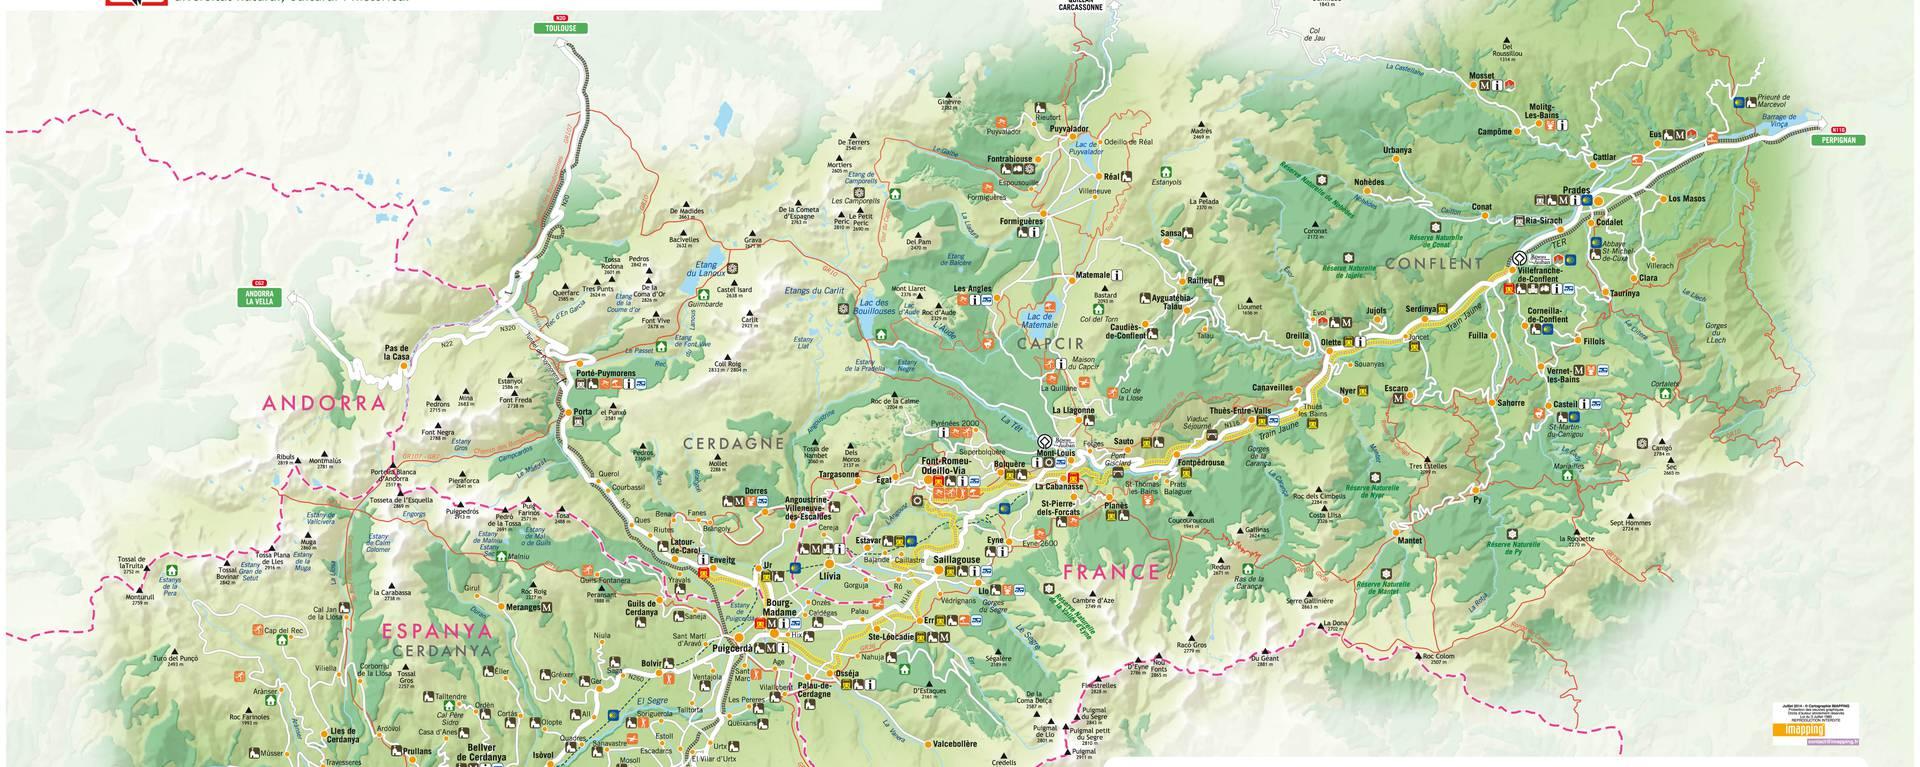 Territoire des Pyrénées Catalanes, Cerdagne, Capcir, Cerdanya